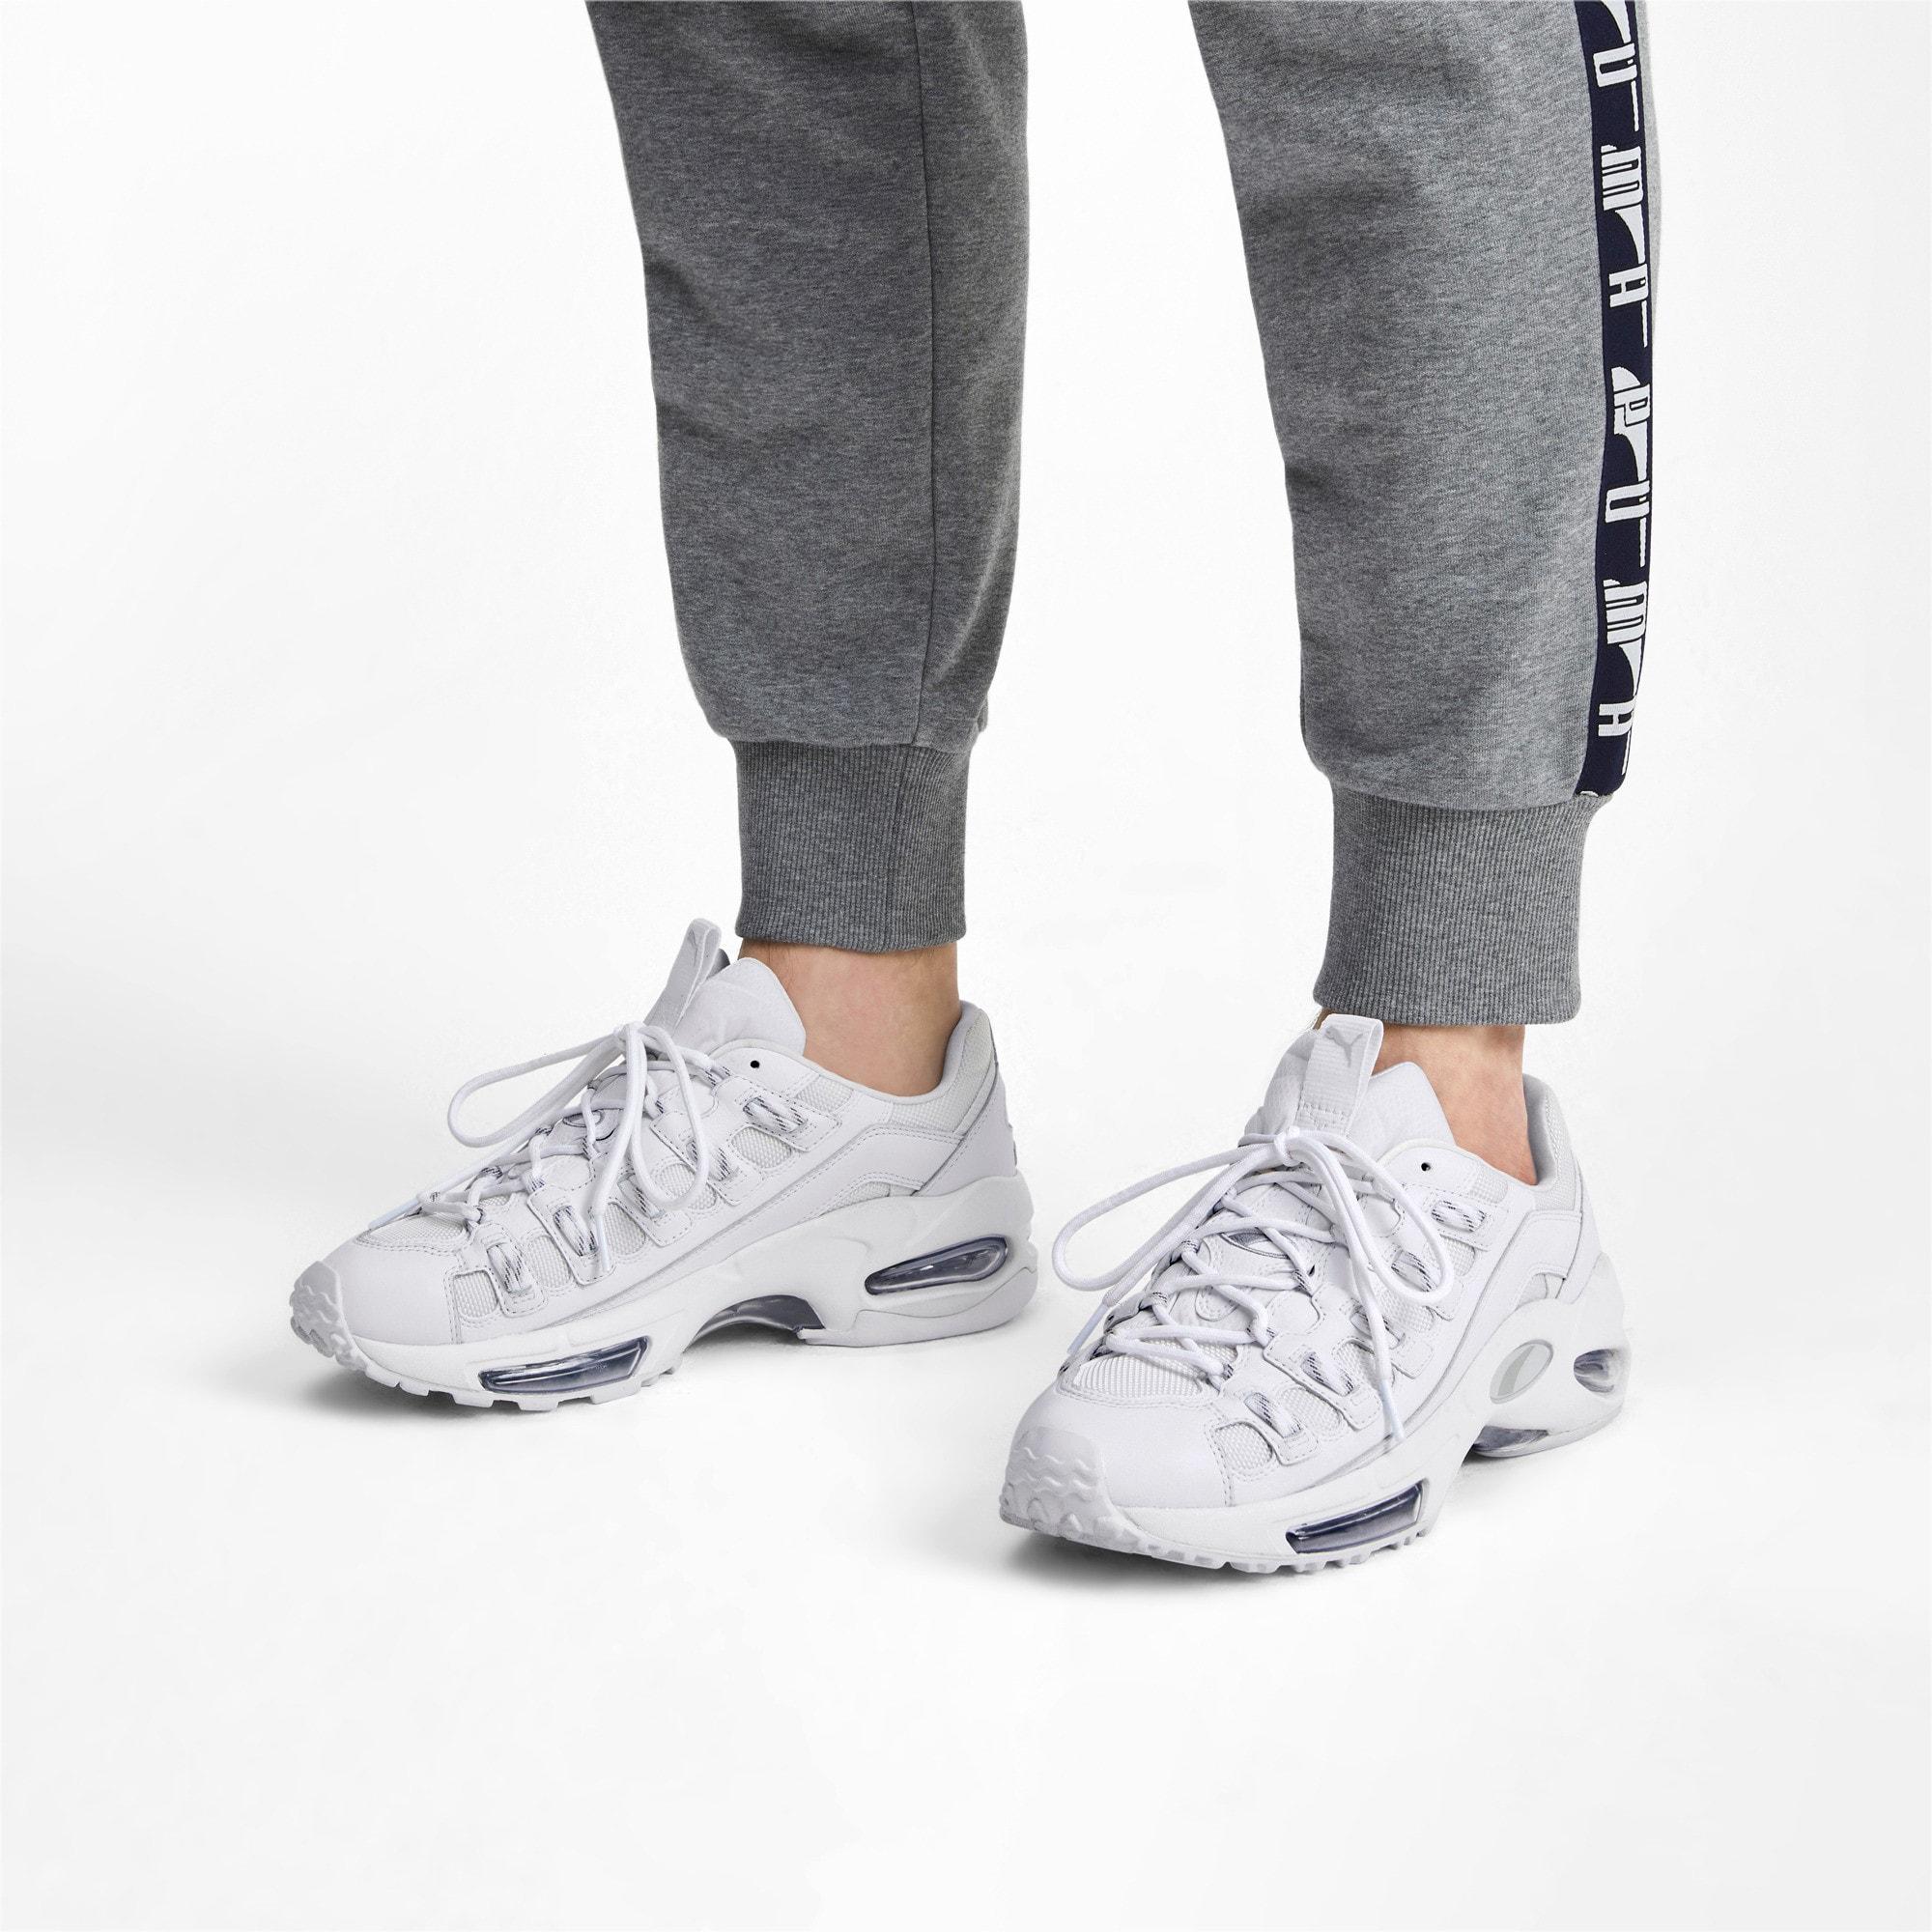 Thumbnail 2 of CELL Endura Rebound Sneaker, Puma White-Puma White, medium